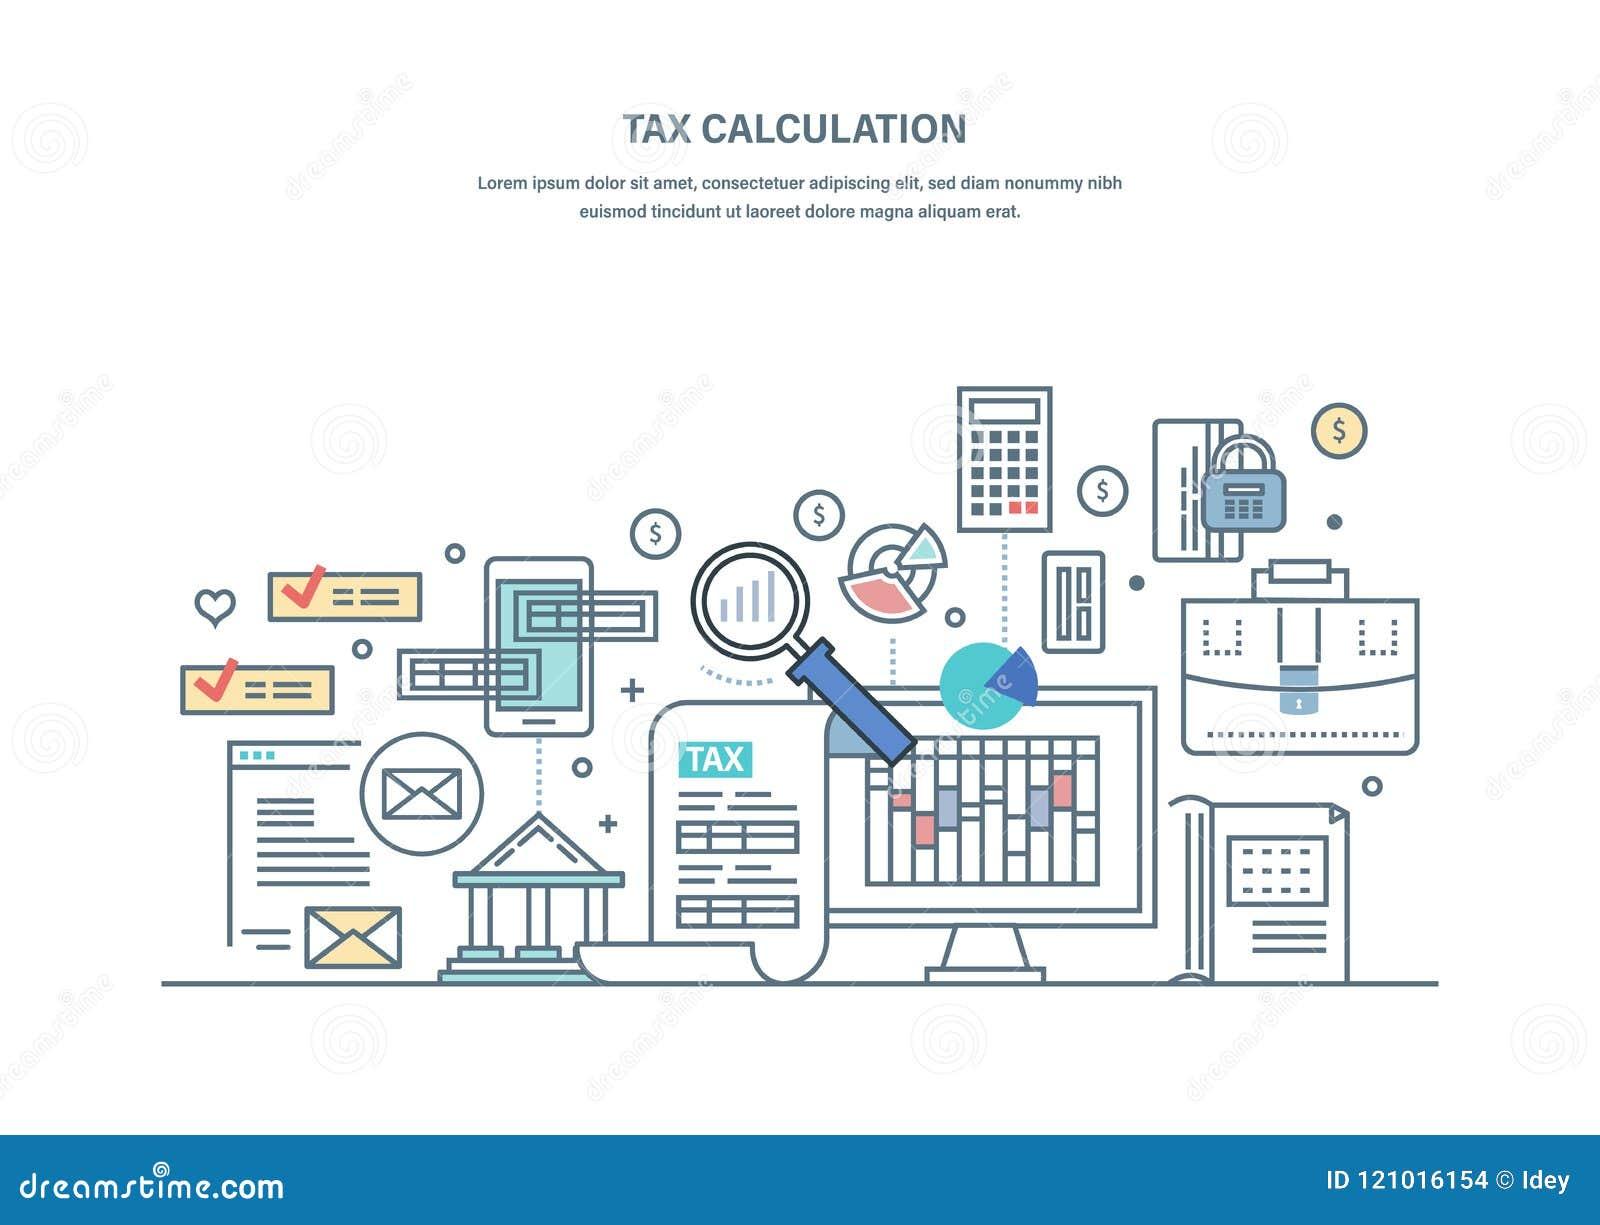 Cálculos financeiros do imposto, pesquisa explicando, contando o lucro, renda, auditoria do negócio